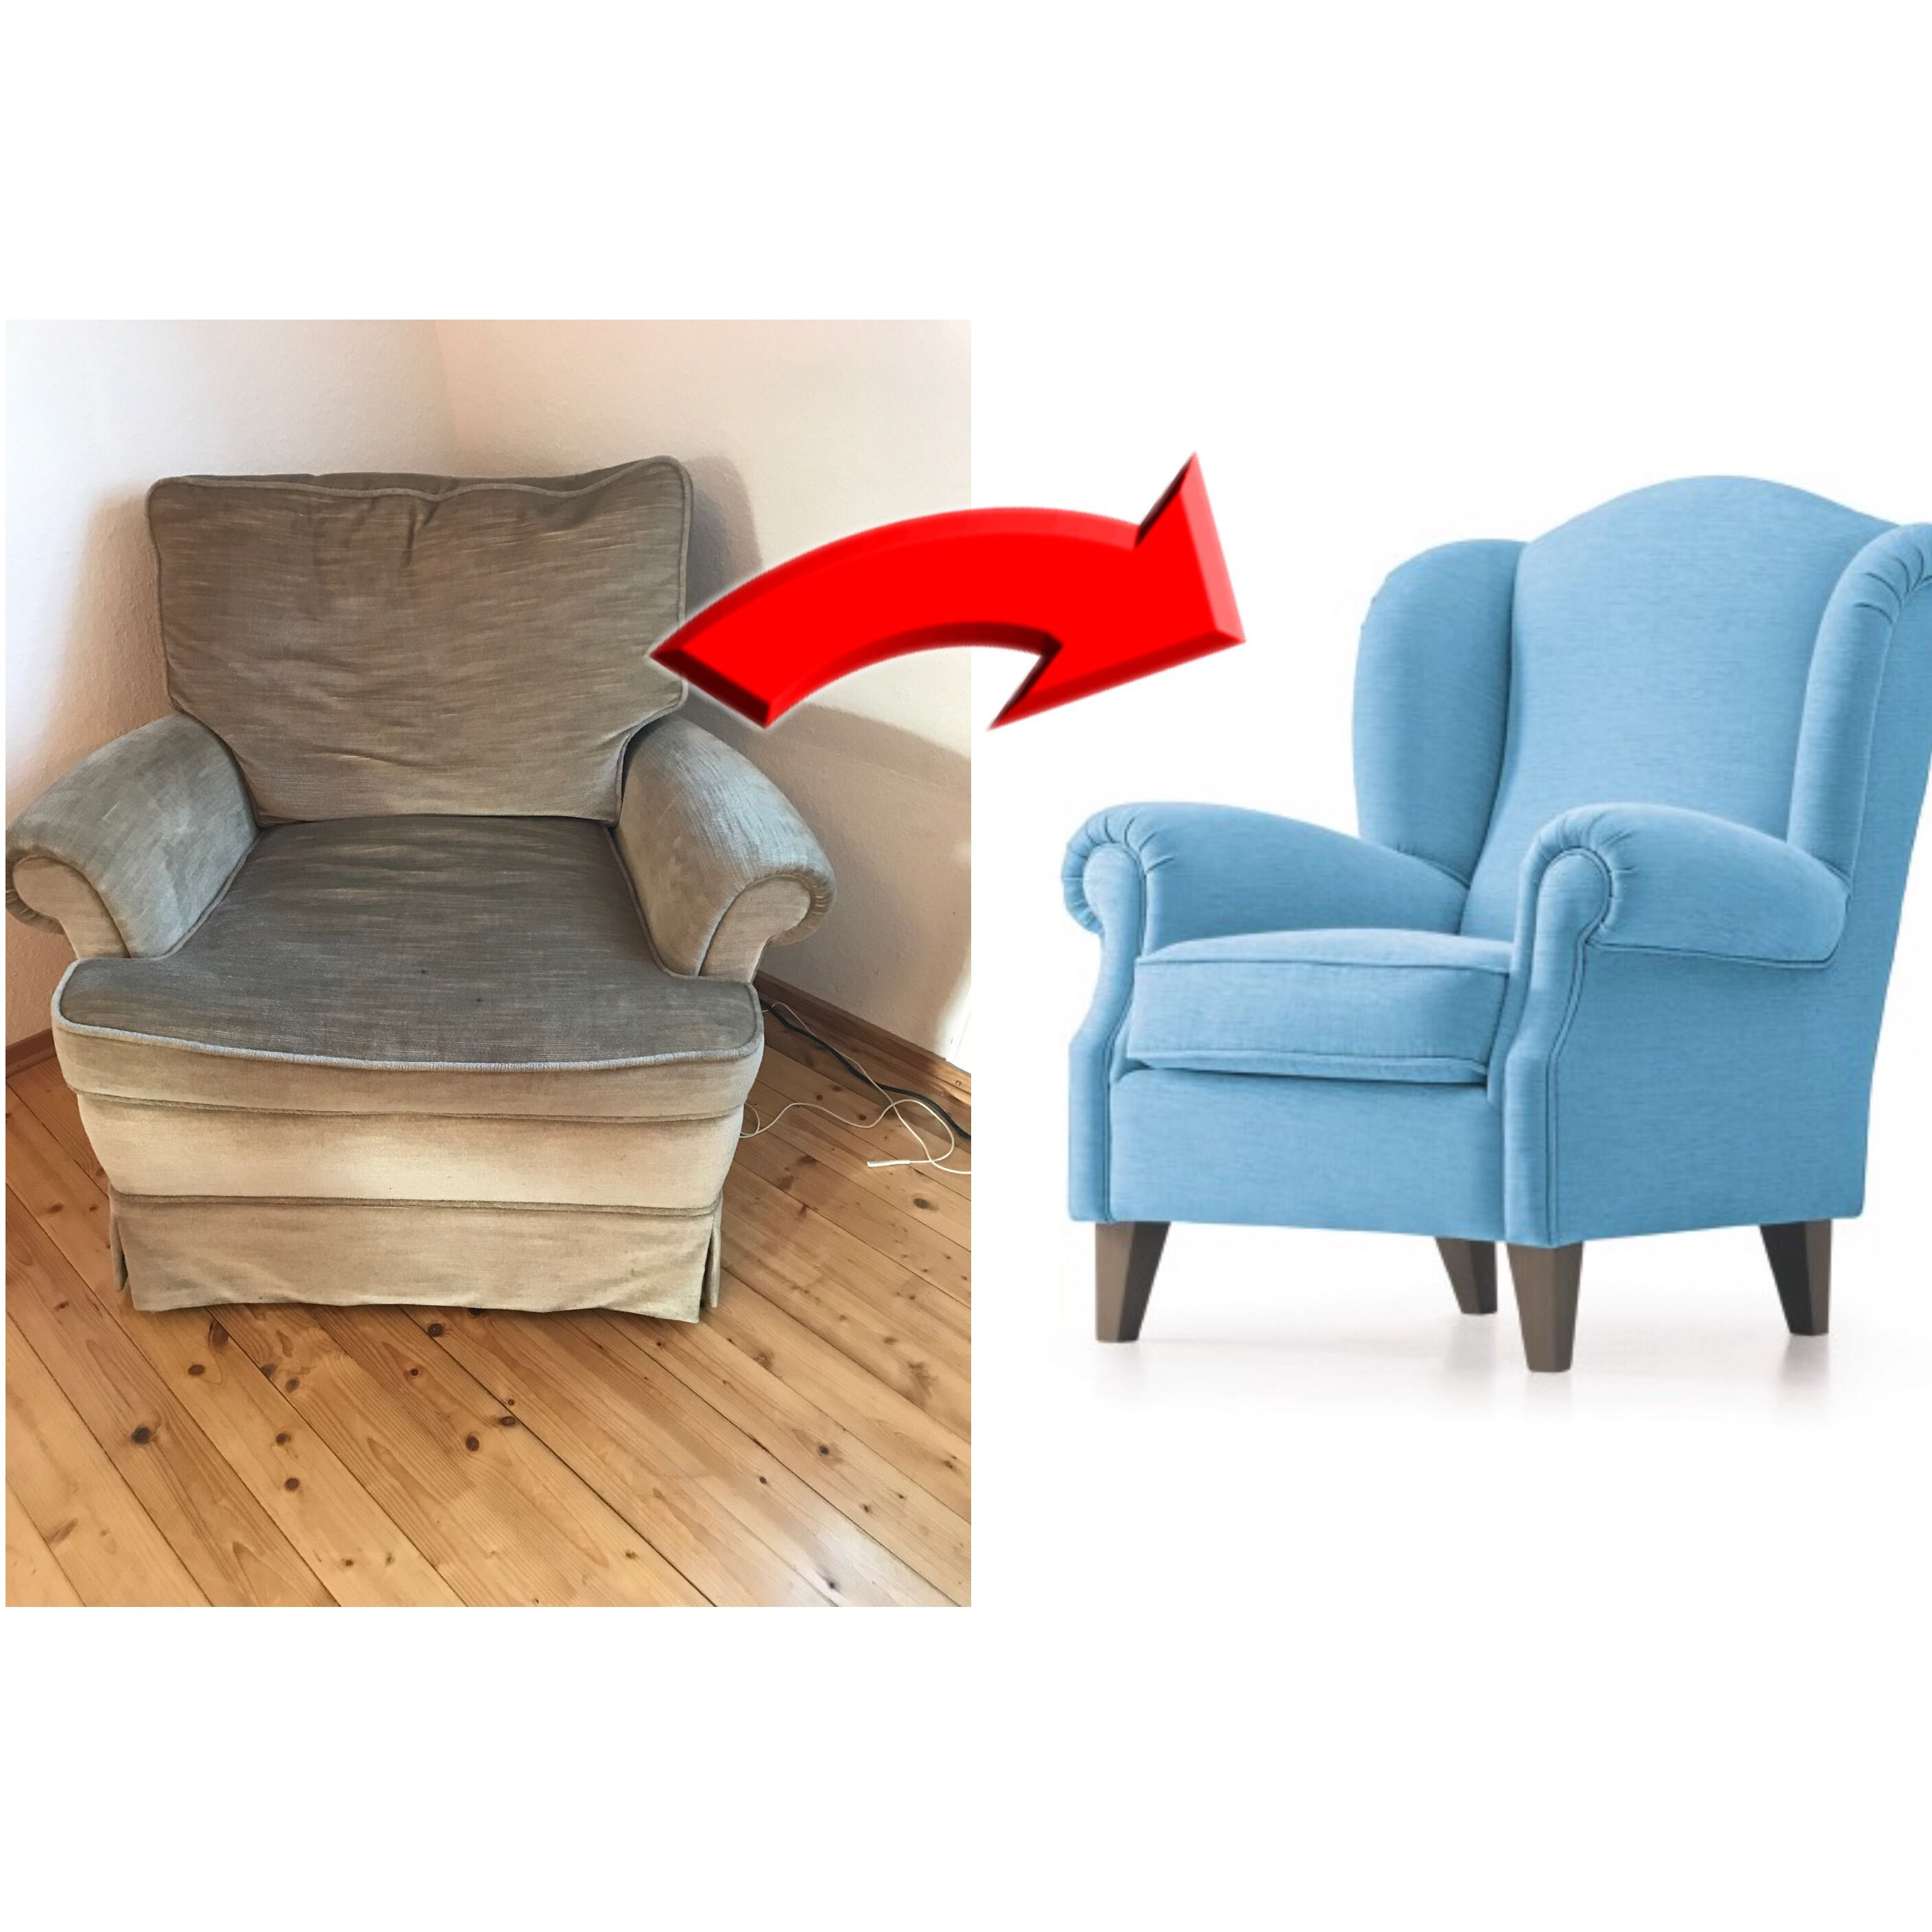 sessel einf rben williamflooring. Black Bedroom Furniture Sets. Home Design Ideas